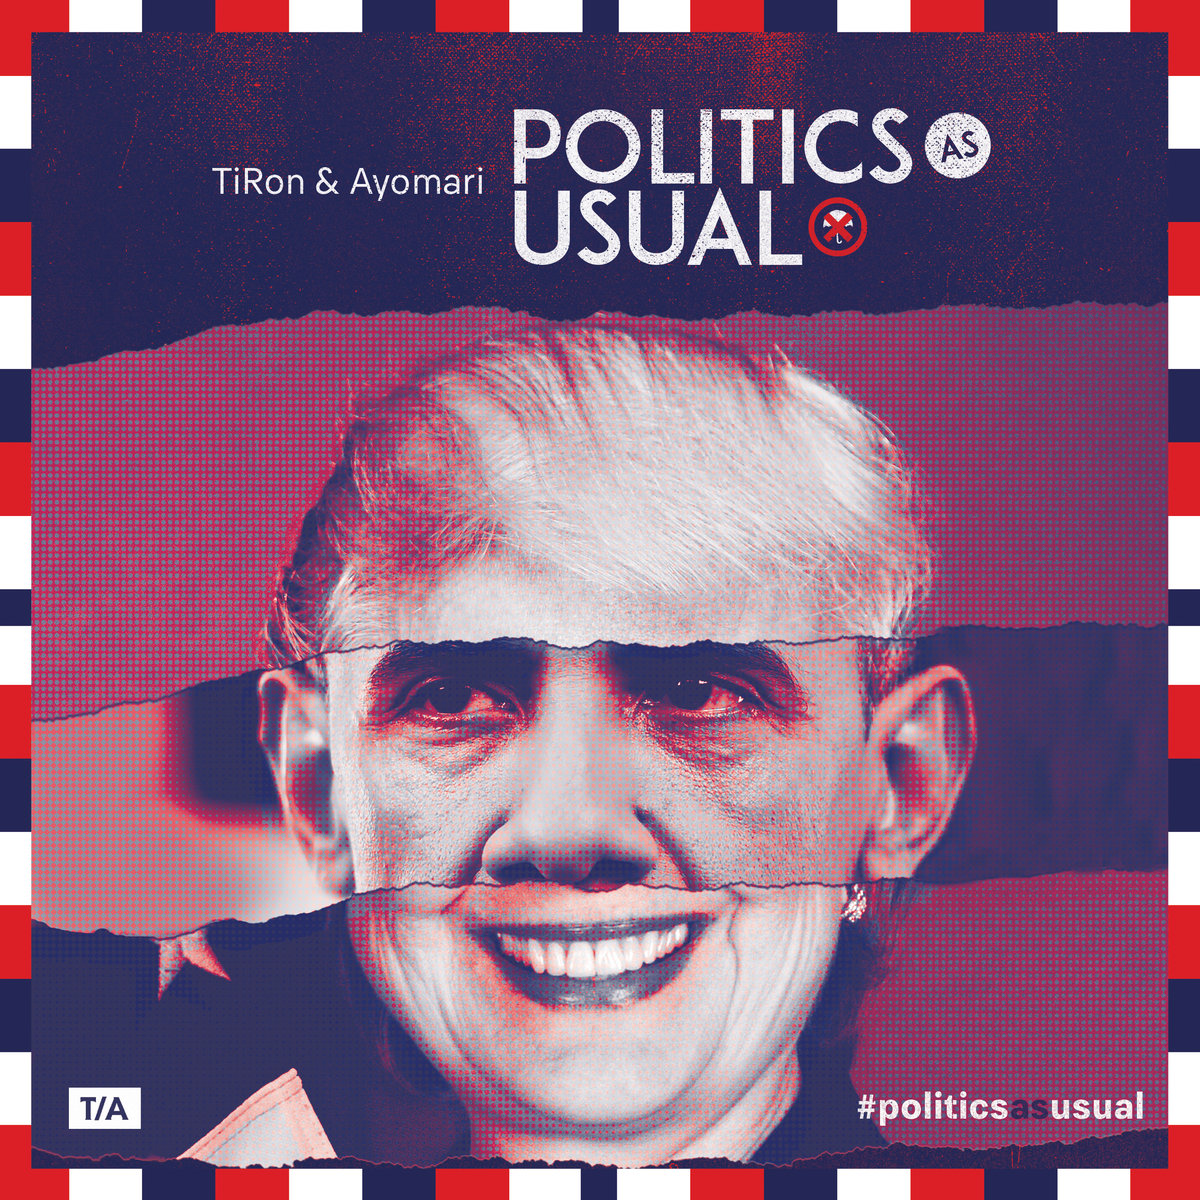 TiRonAyomari-PoliticsAsUsual